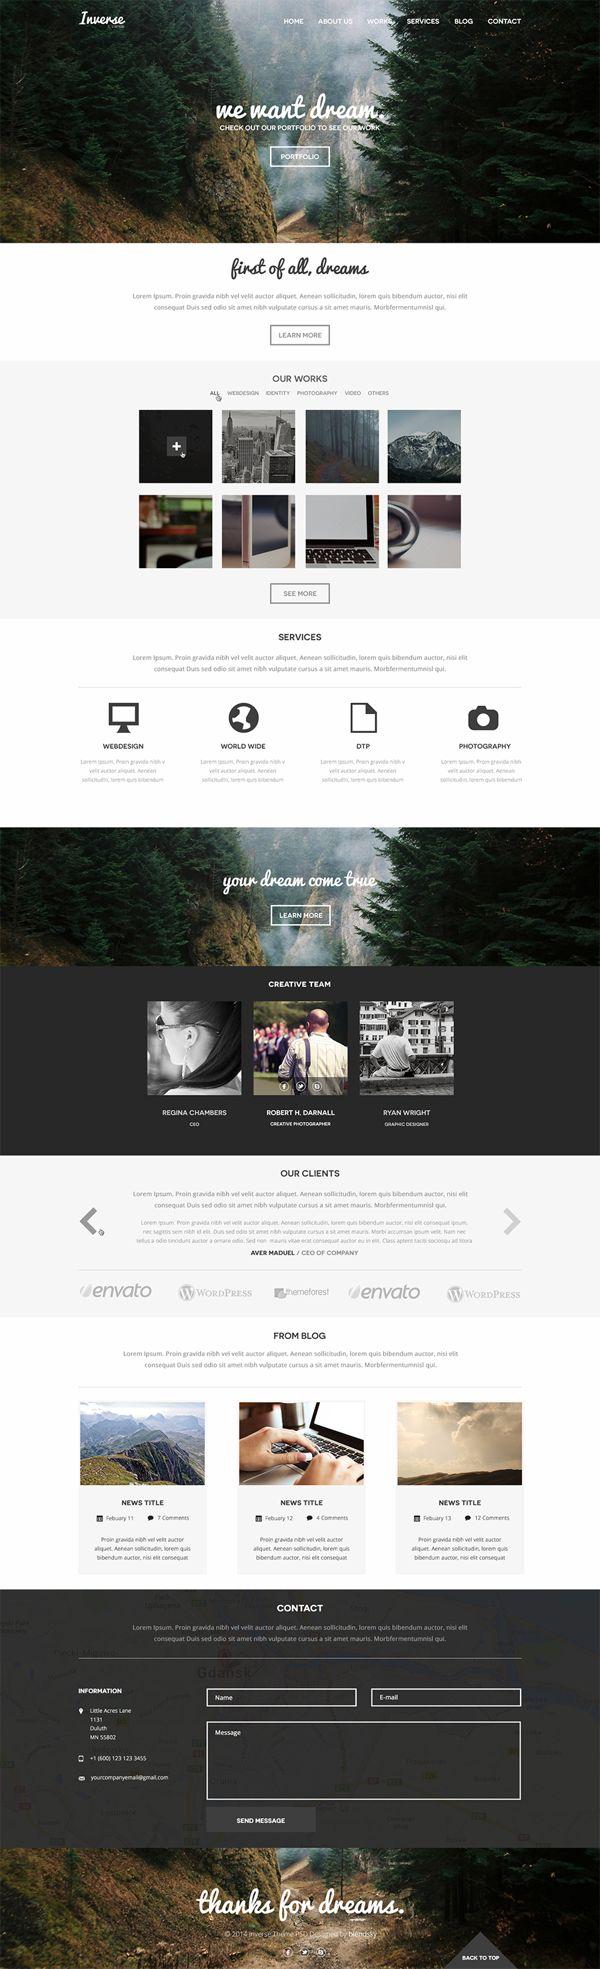 INVERSE on Web Design Served